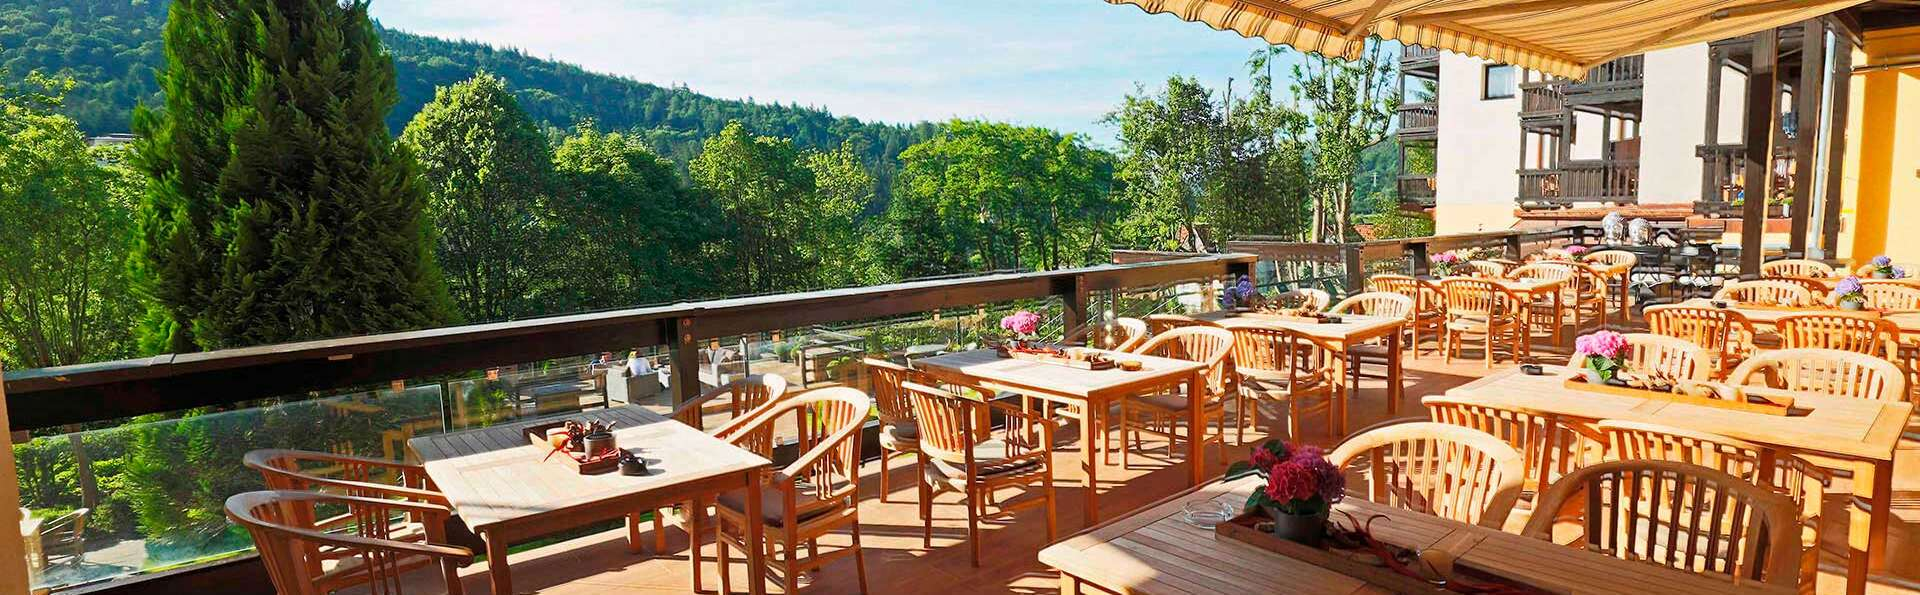 Parkhotel Luise Bad Herrenalb - EDIT_NEW_restauranterrace.jpg